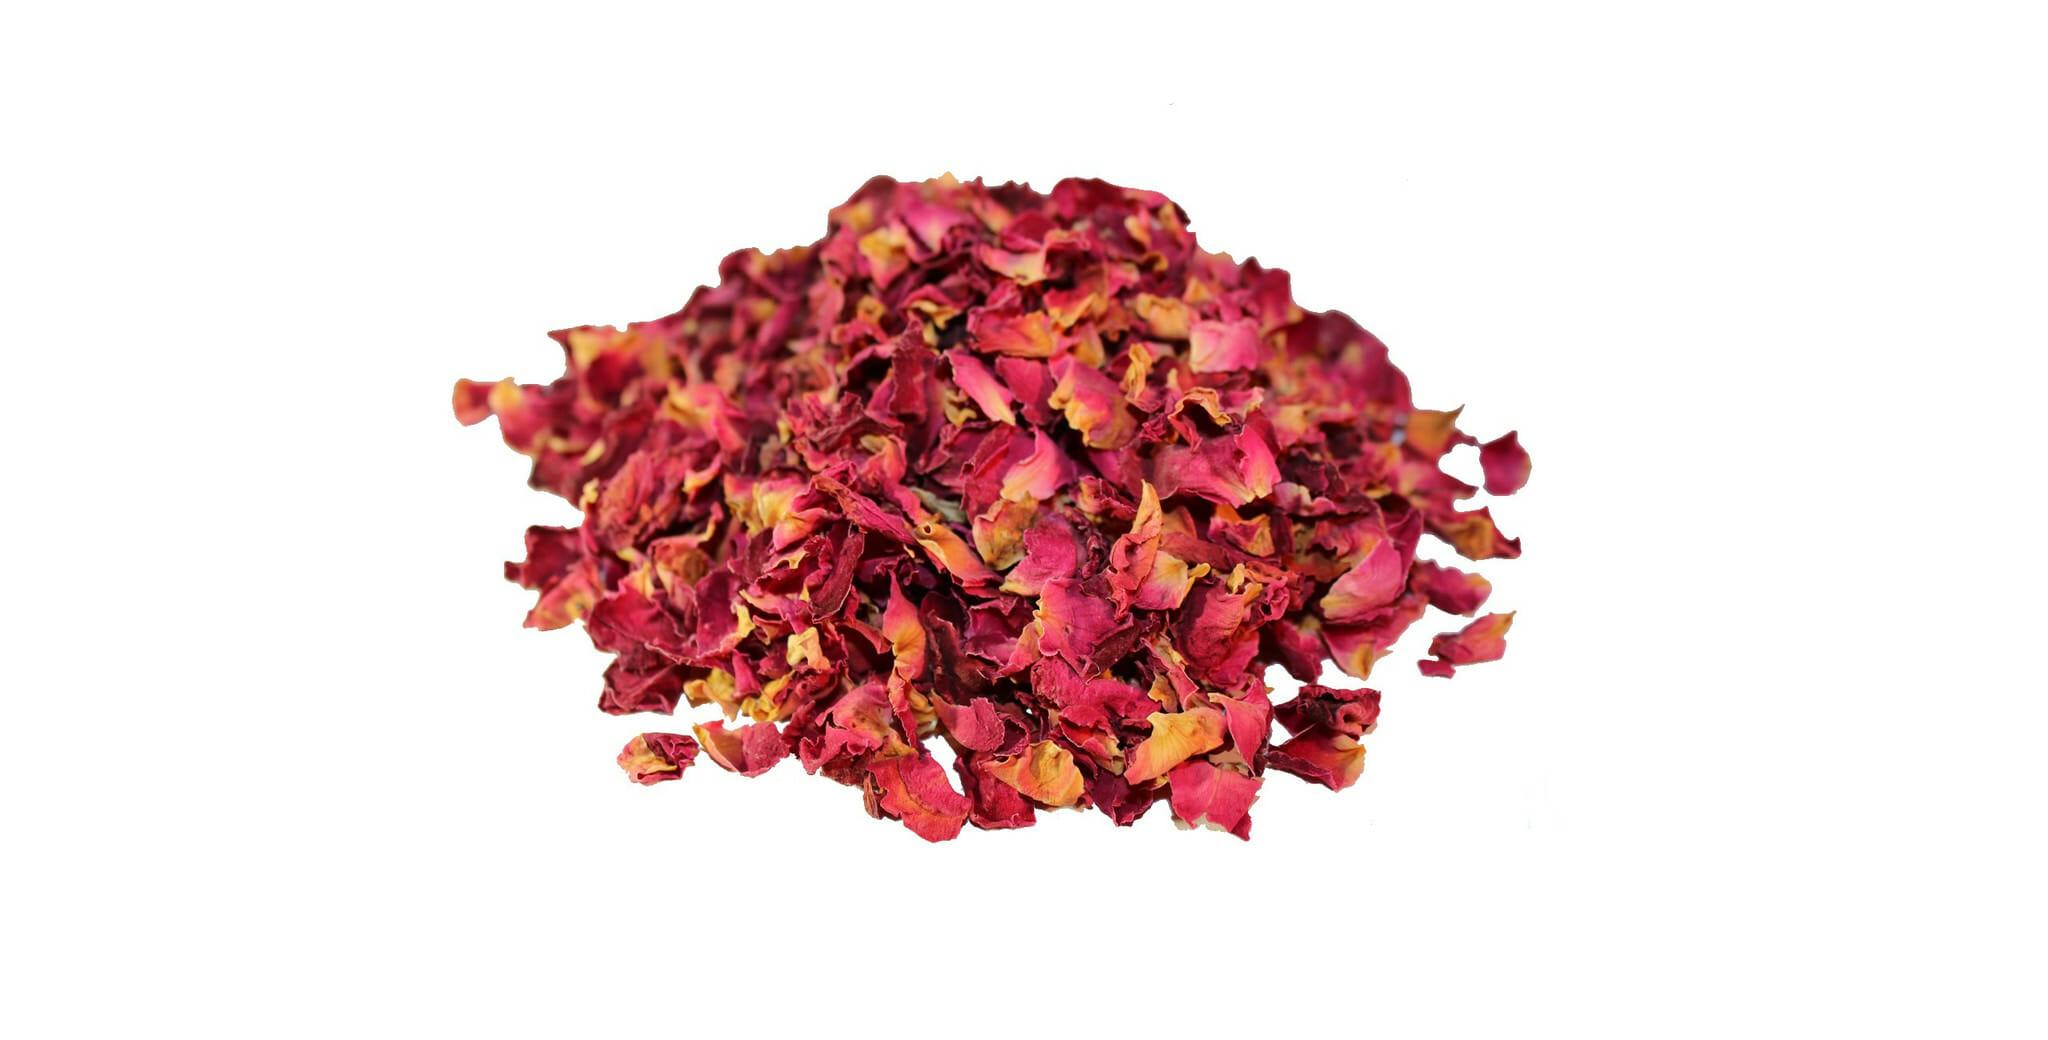 Imagini pentru roses petals dried